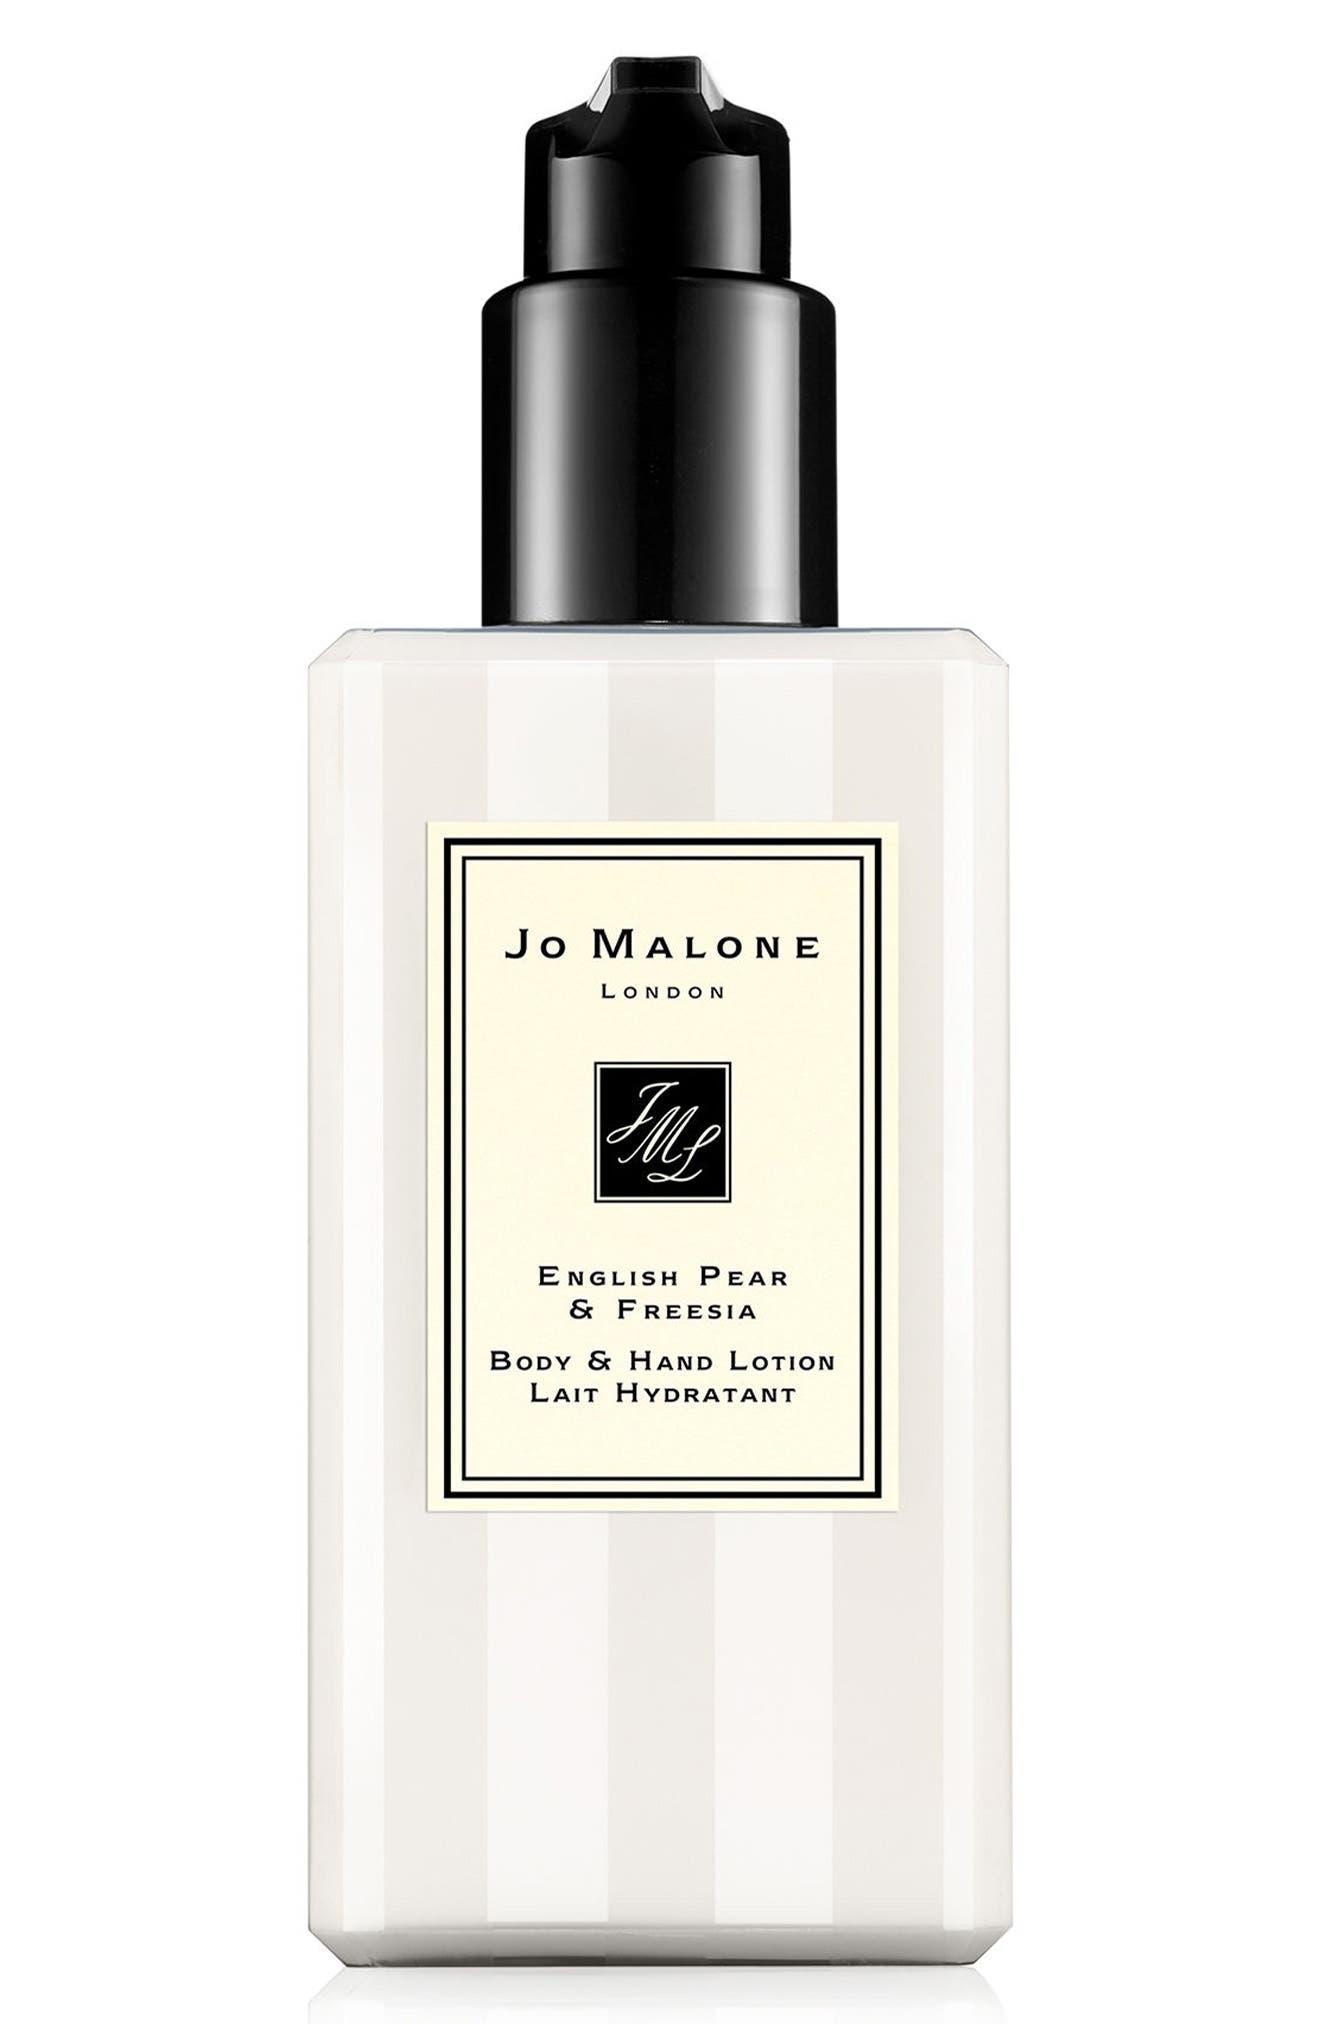 Alternate Image 1 Selected - Jo Malone London™ 'English Pear & Freesia' Body & Hand Lotion